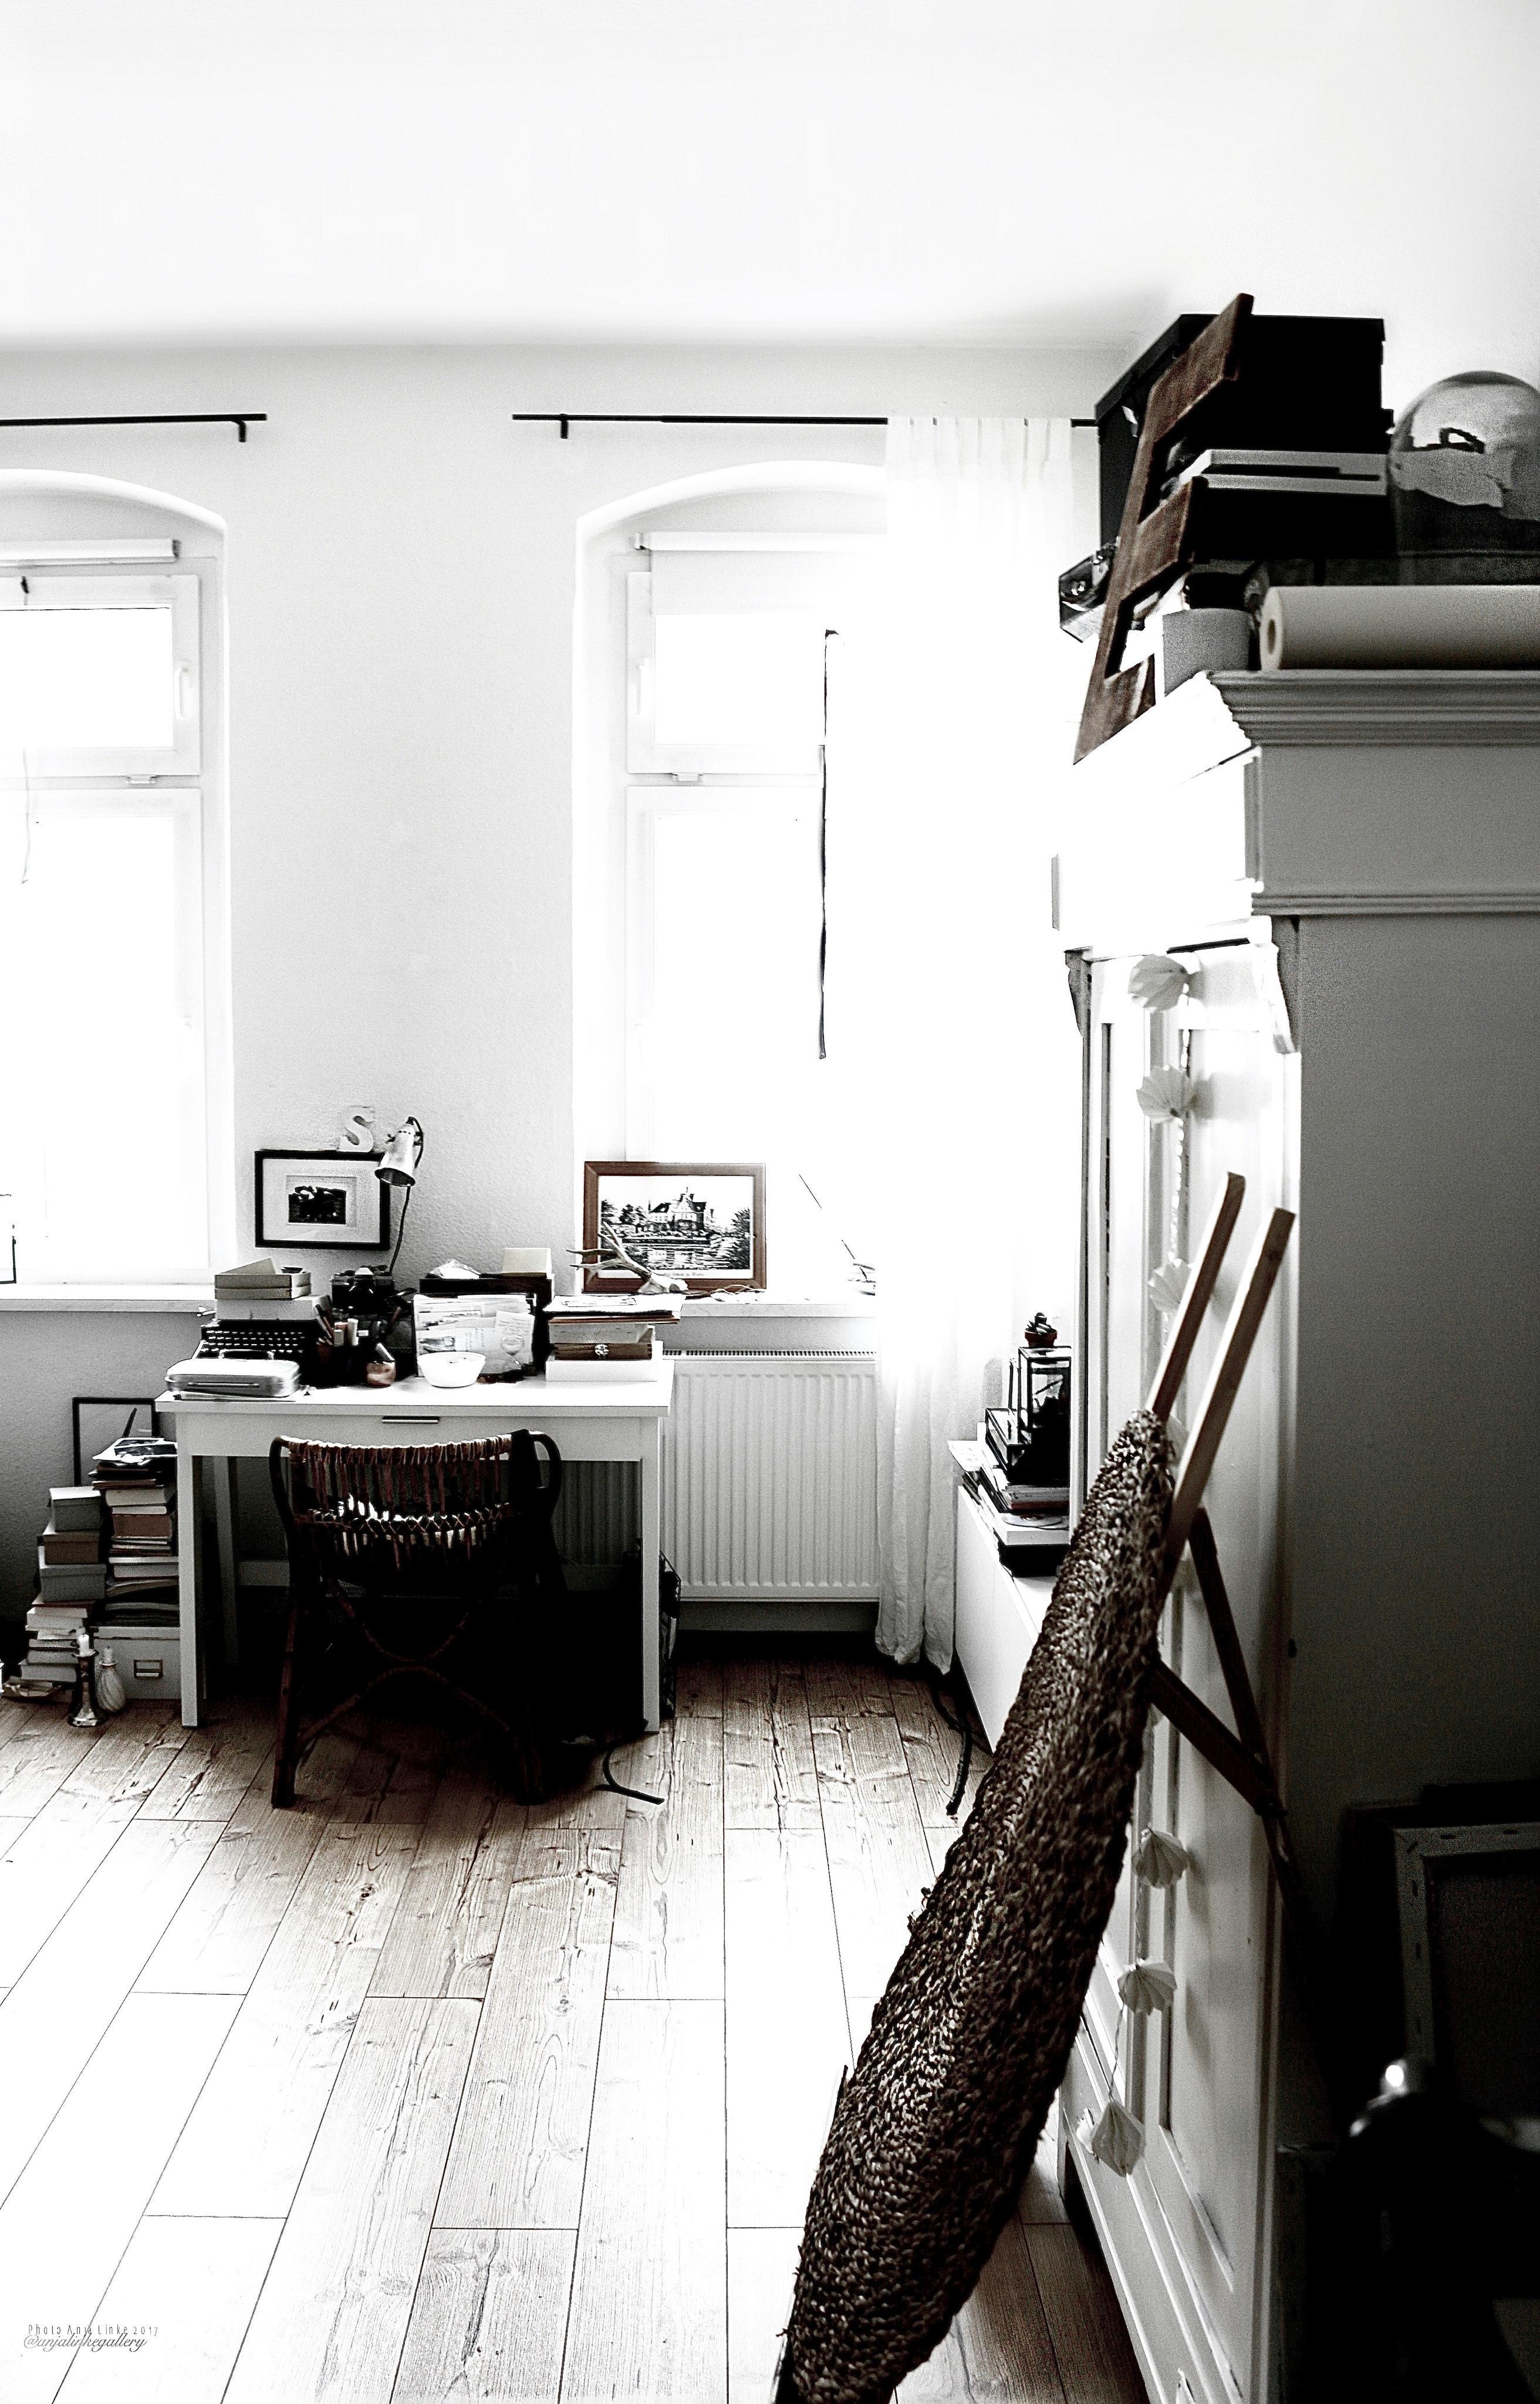 Laminat Ideen laminat bilder ideen couchstyle